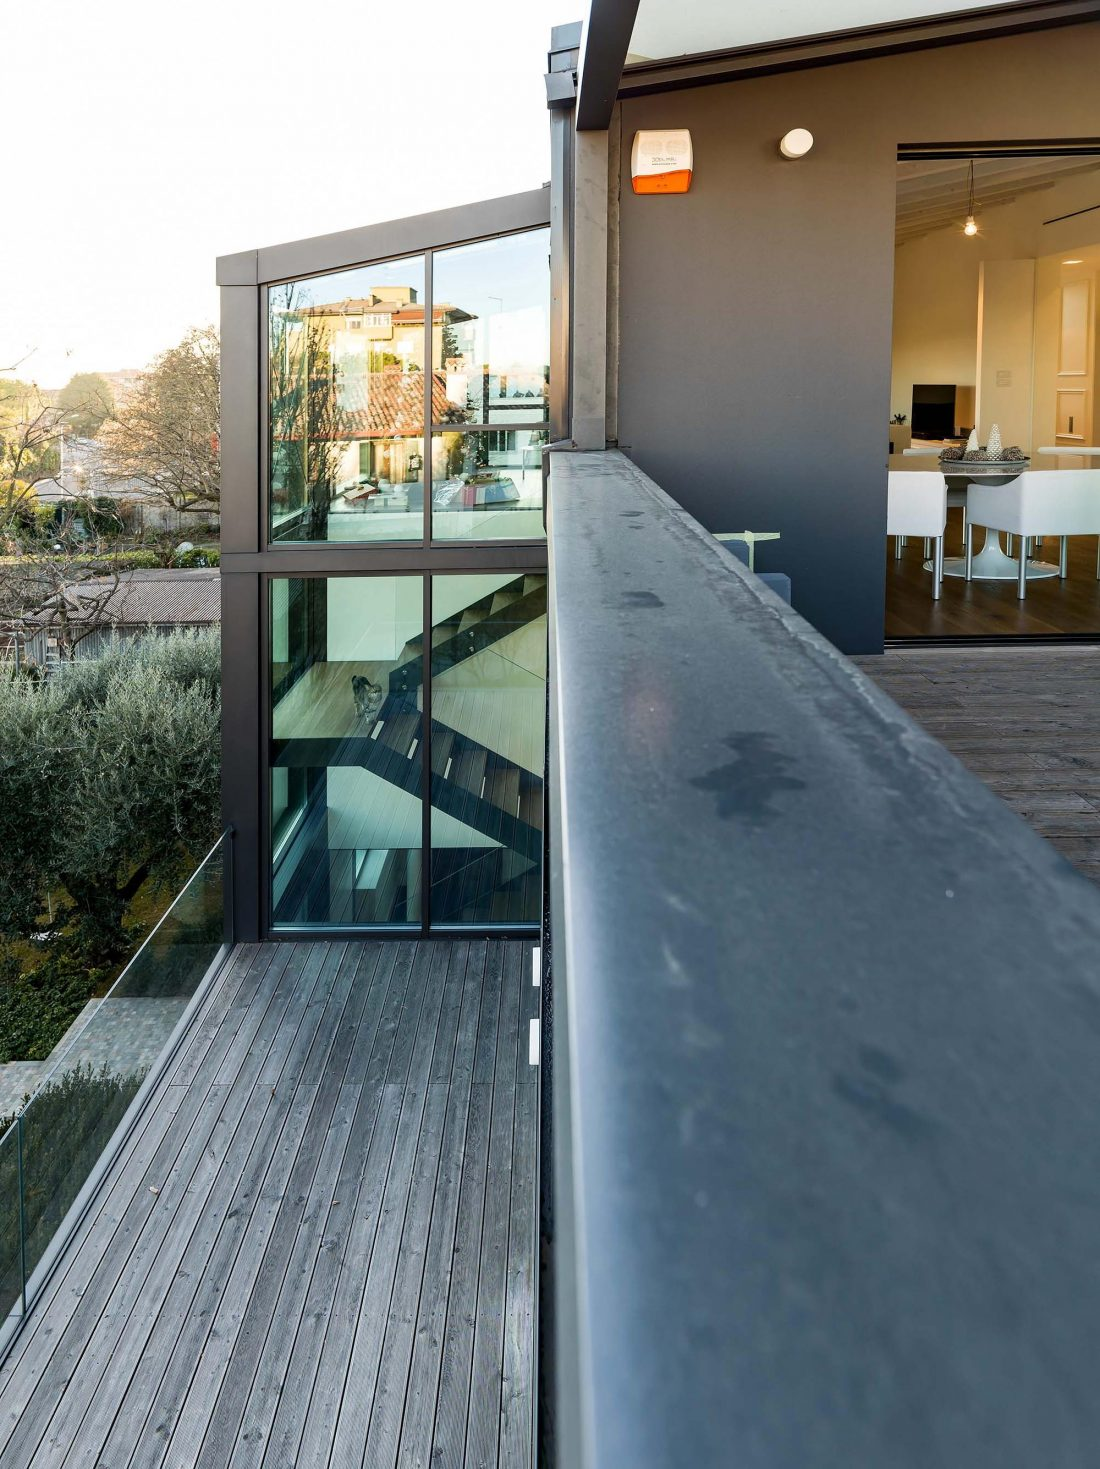 Дом в Порденоне, Италия, от студии Caprioglio Associati Architects 10